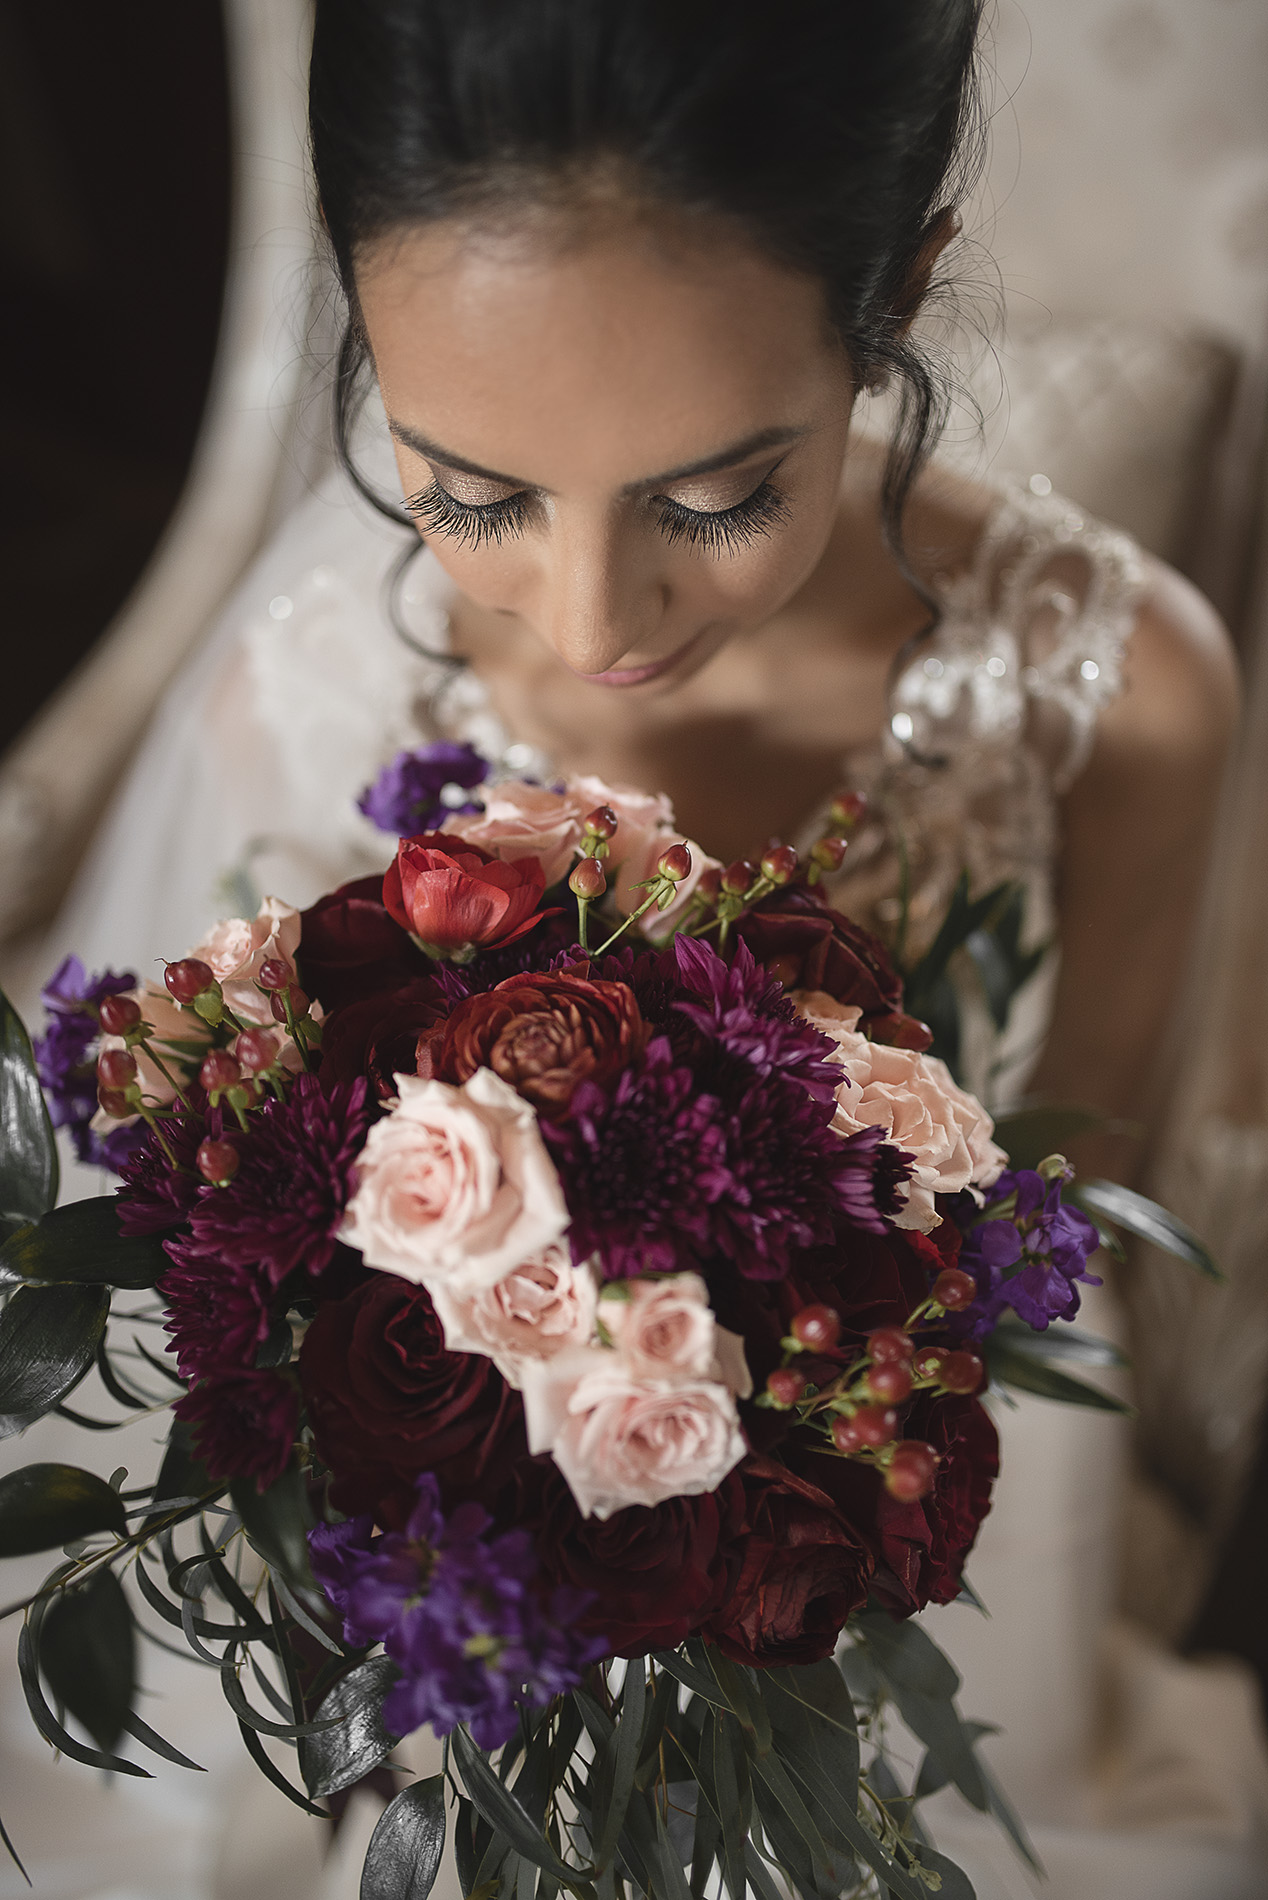 Houston-venue-Olde-Dobbin-Station-Romantic-Classic-Wedding-Photographer-017.jpg